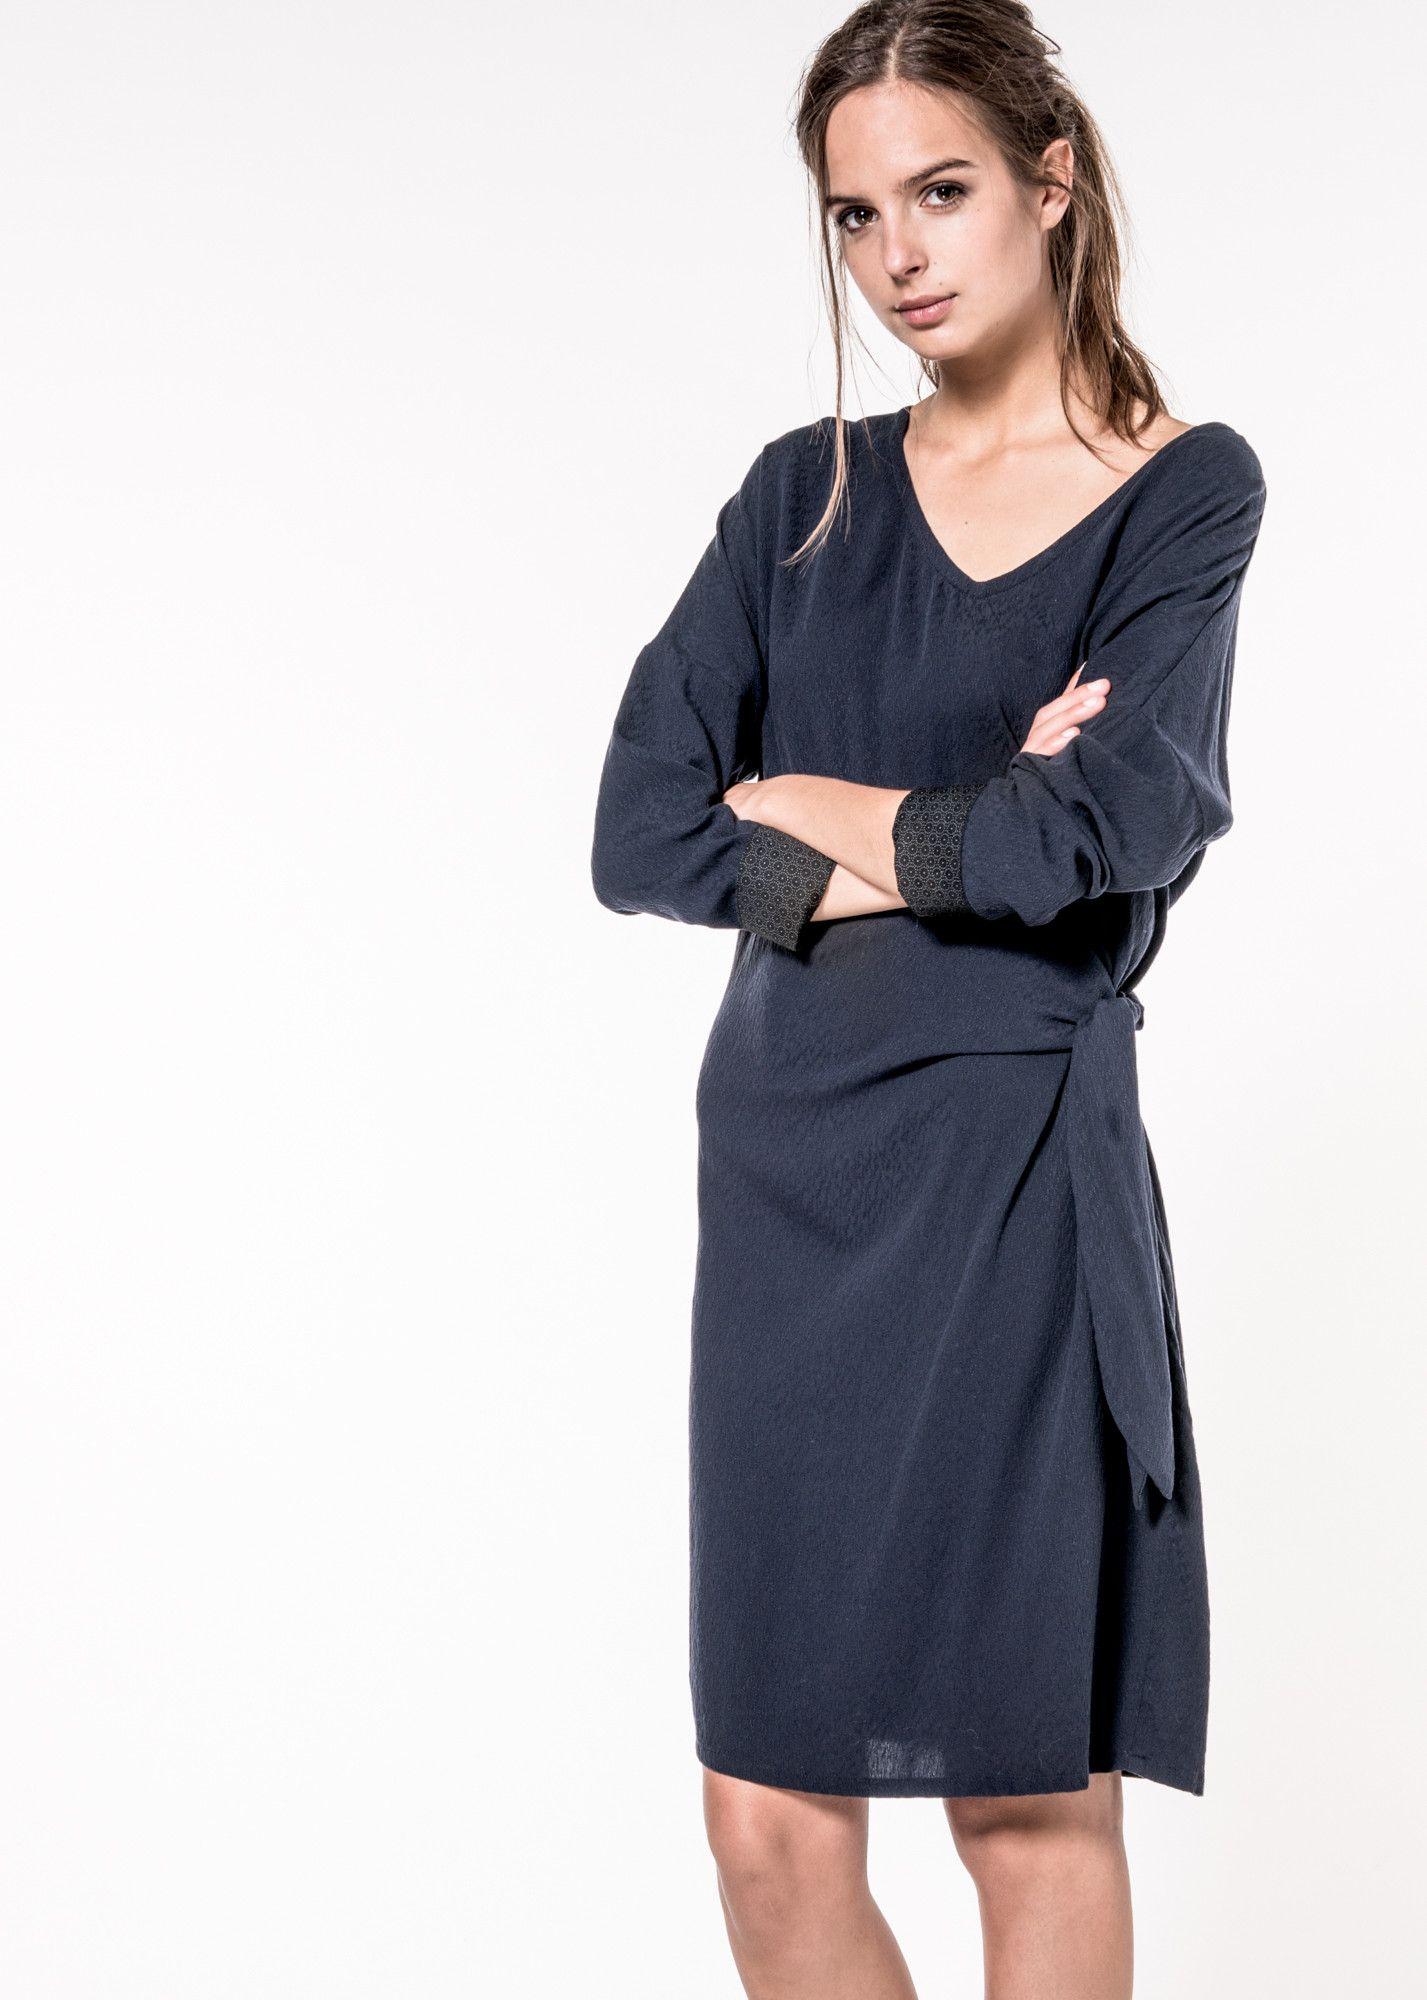 LAWSON 52 F0875 DRESS – Bellerose